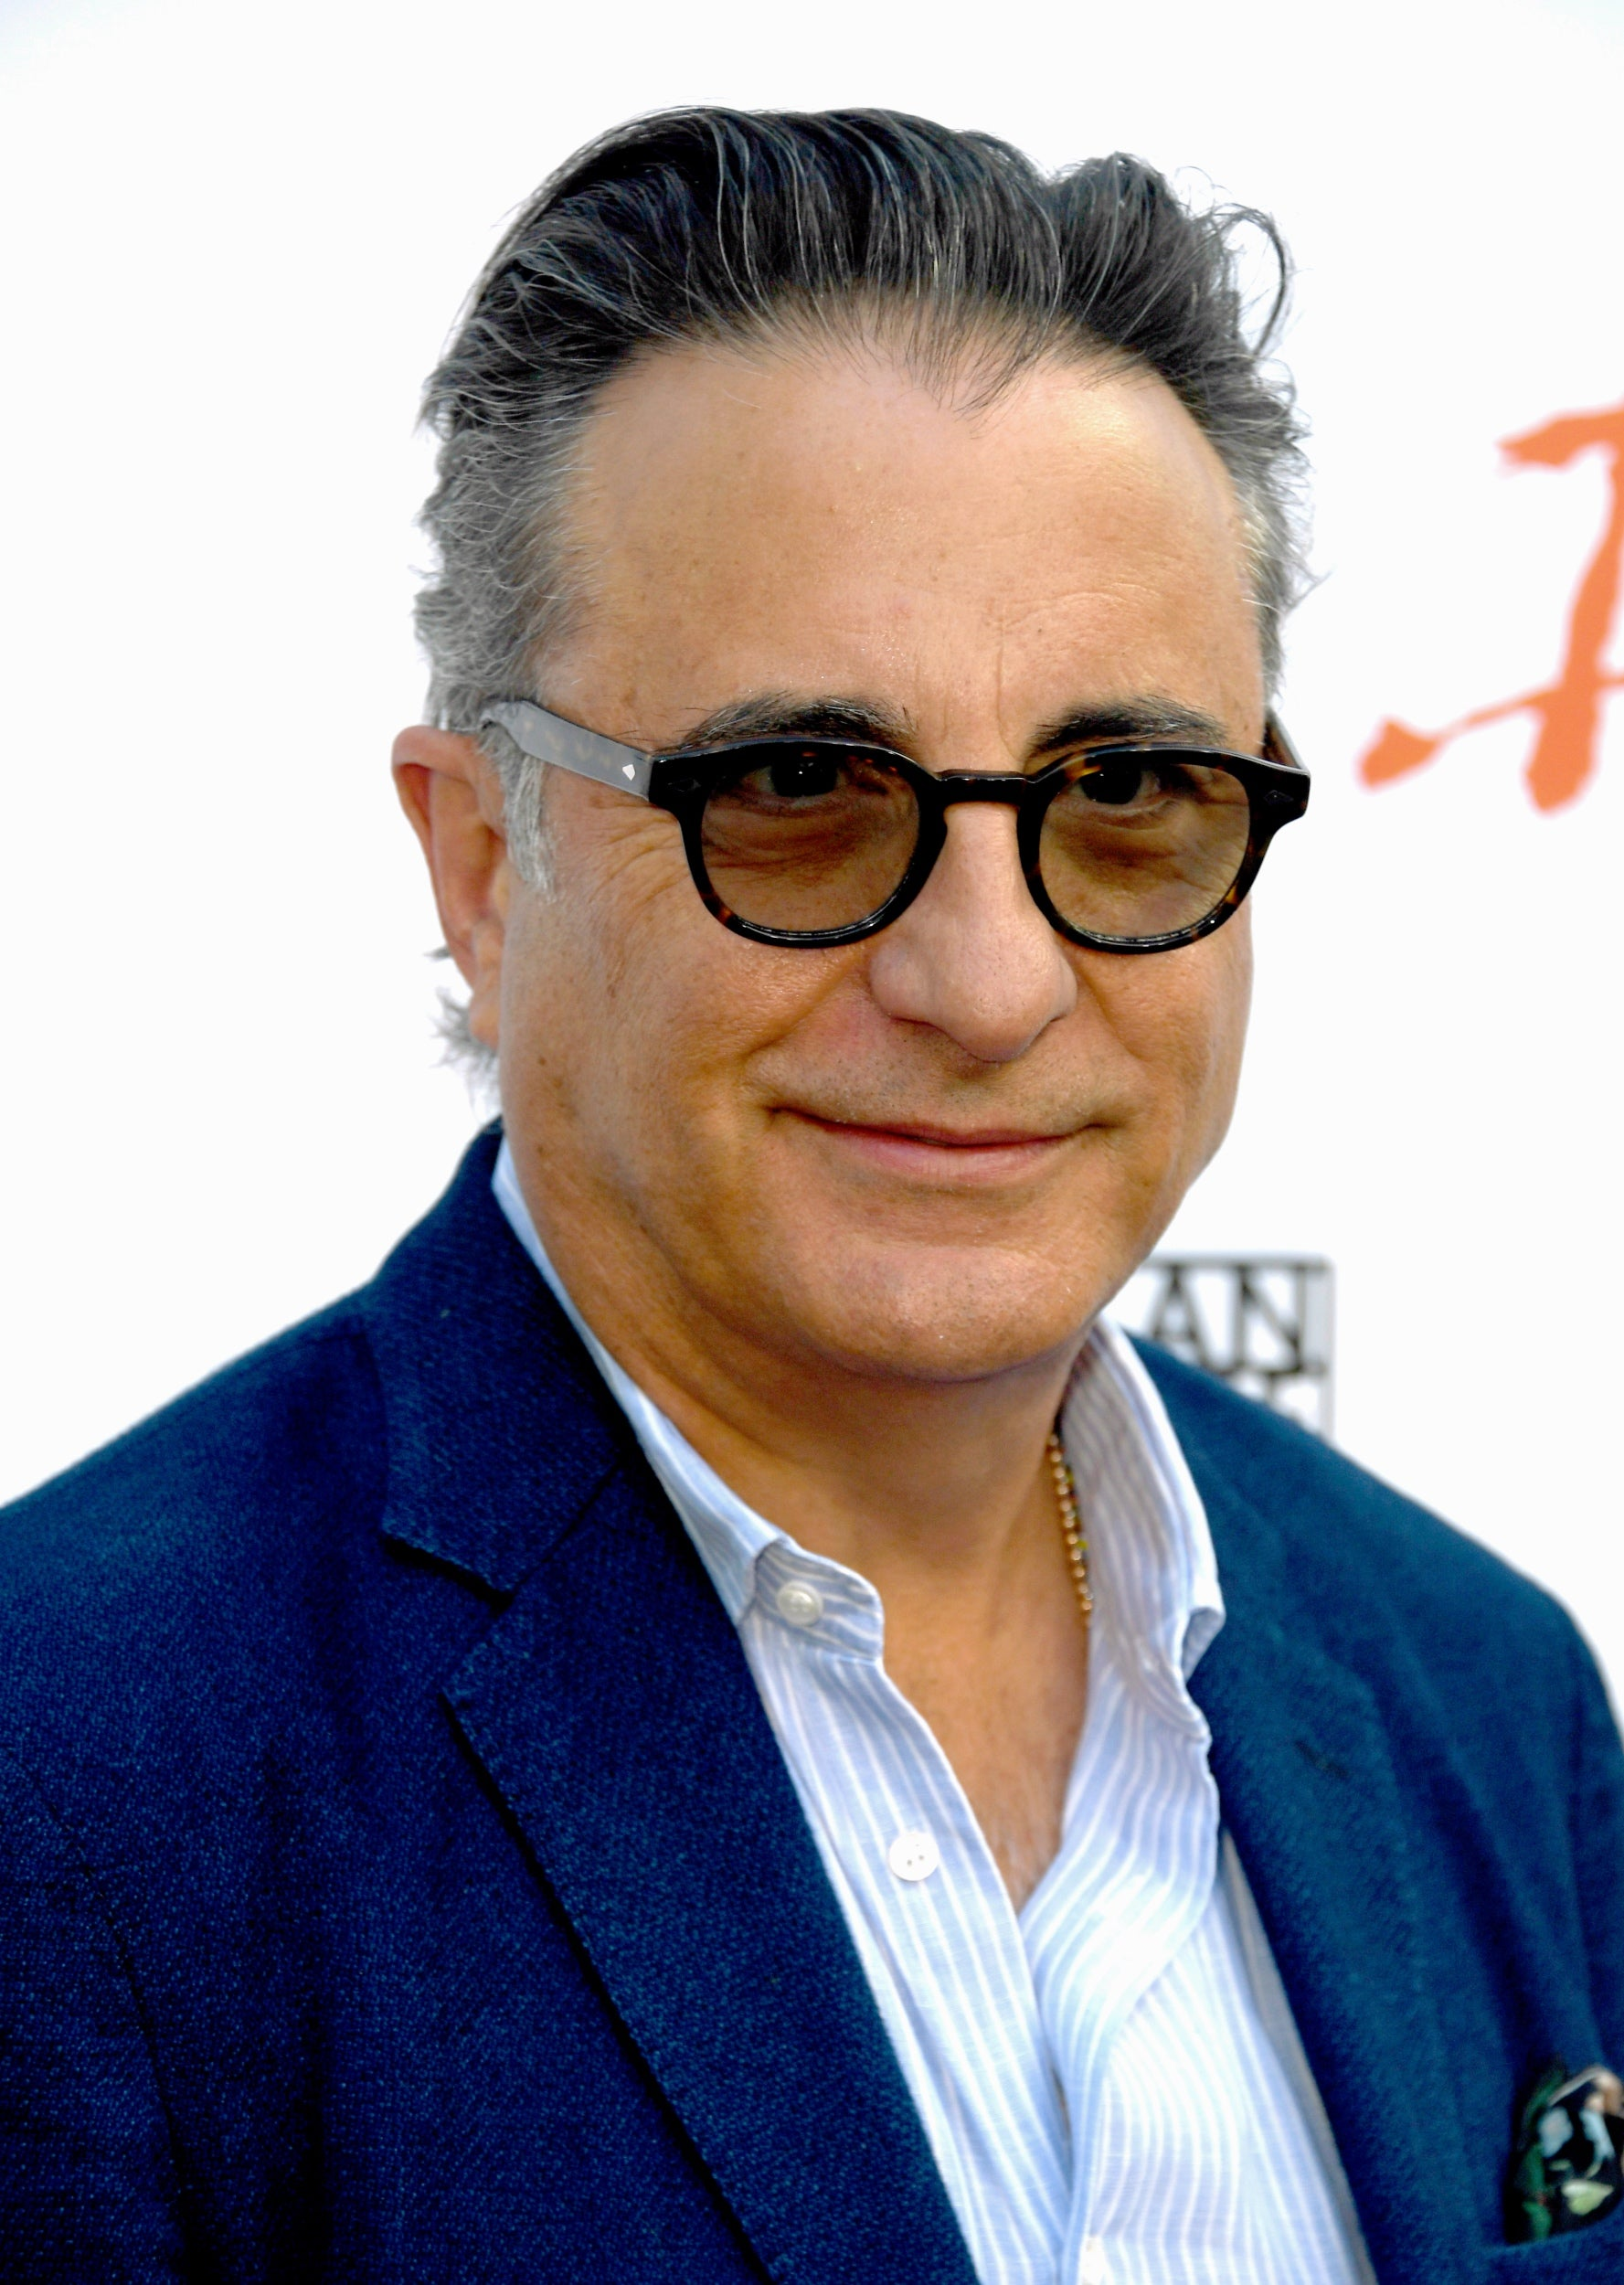 Actor, producer Amdy Garcia. Golden Globe nominee